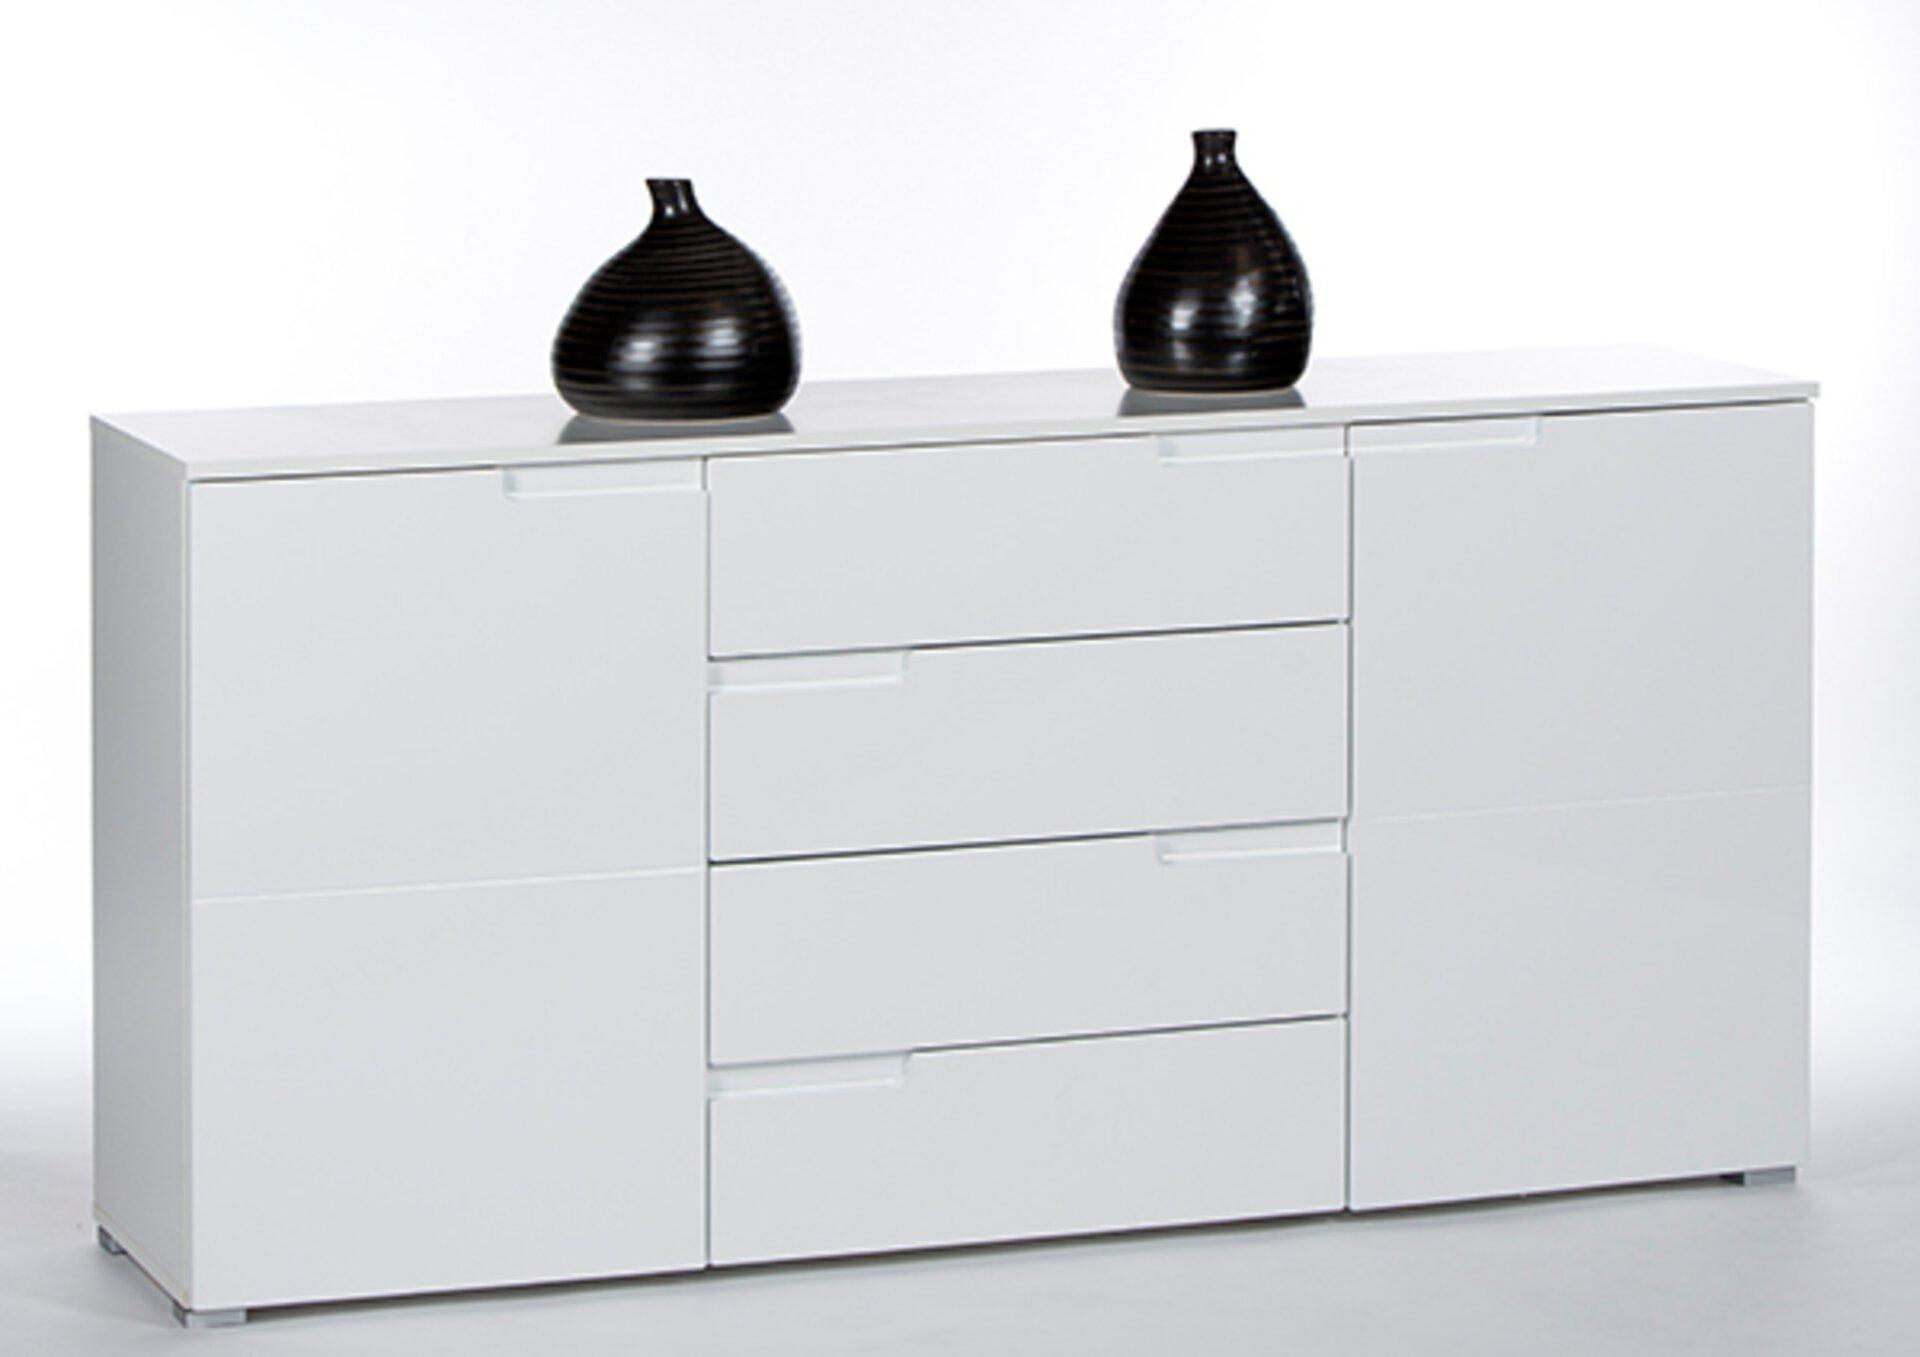 Sideboard SPICE inbuy Holzwerkstoff 1 x 2 x